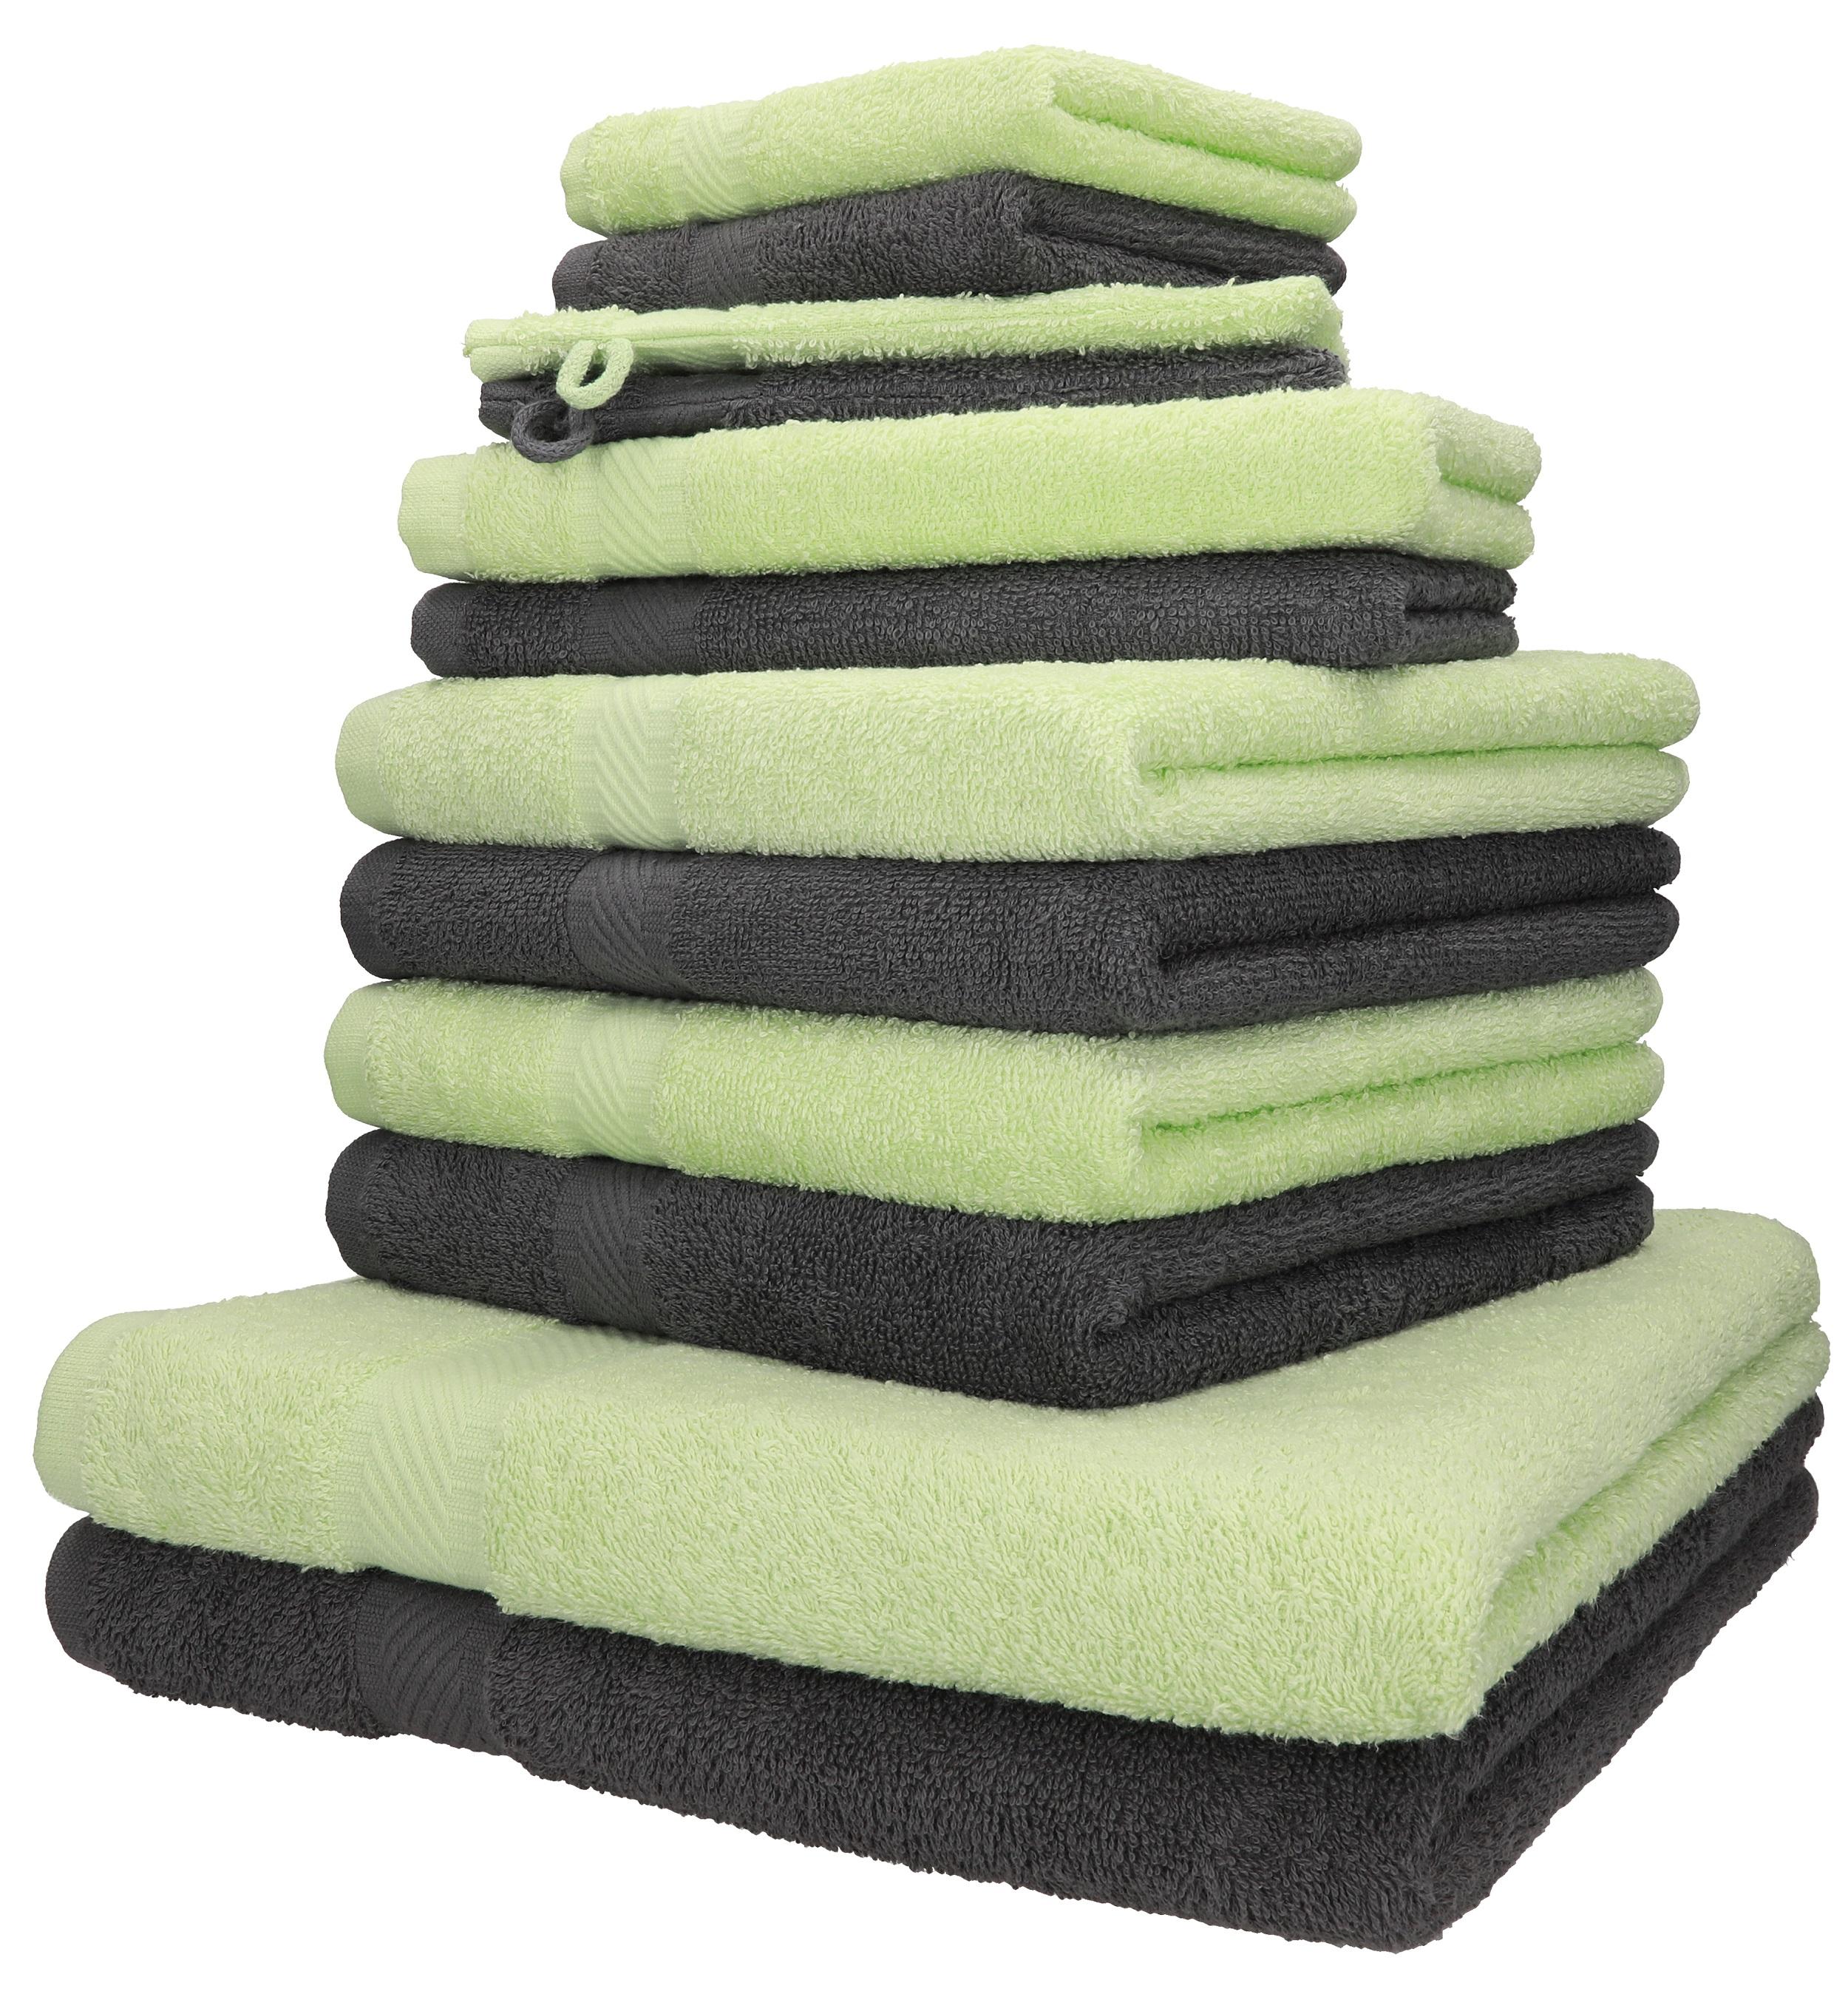 Handtuch-Set PREMIUM 100/% Baumwolle 2 Duschtücher 4 Gästetücher Betz 6-tlg